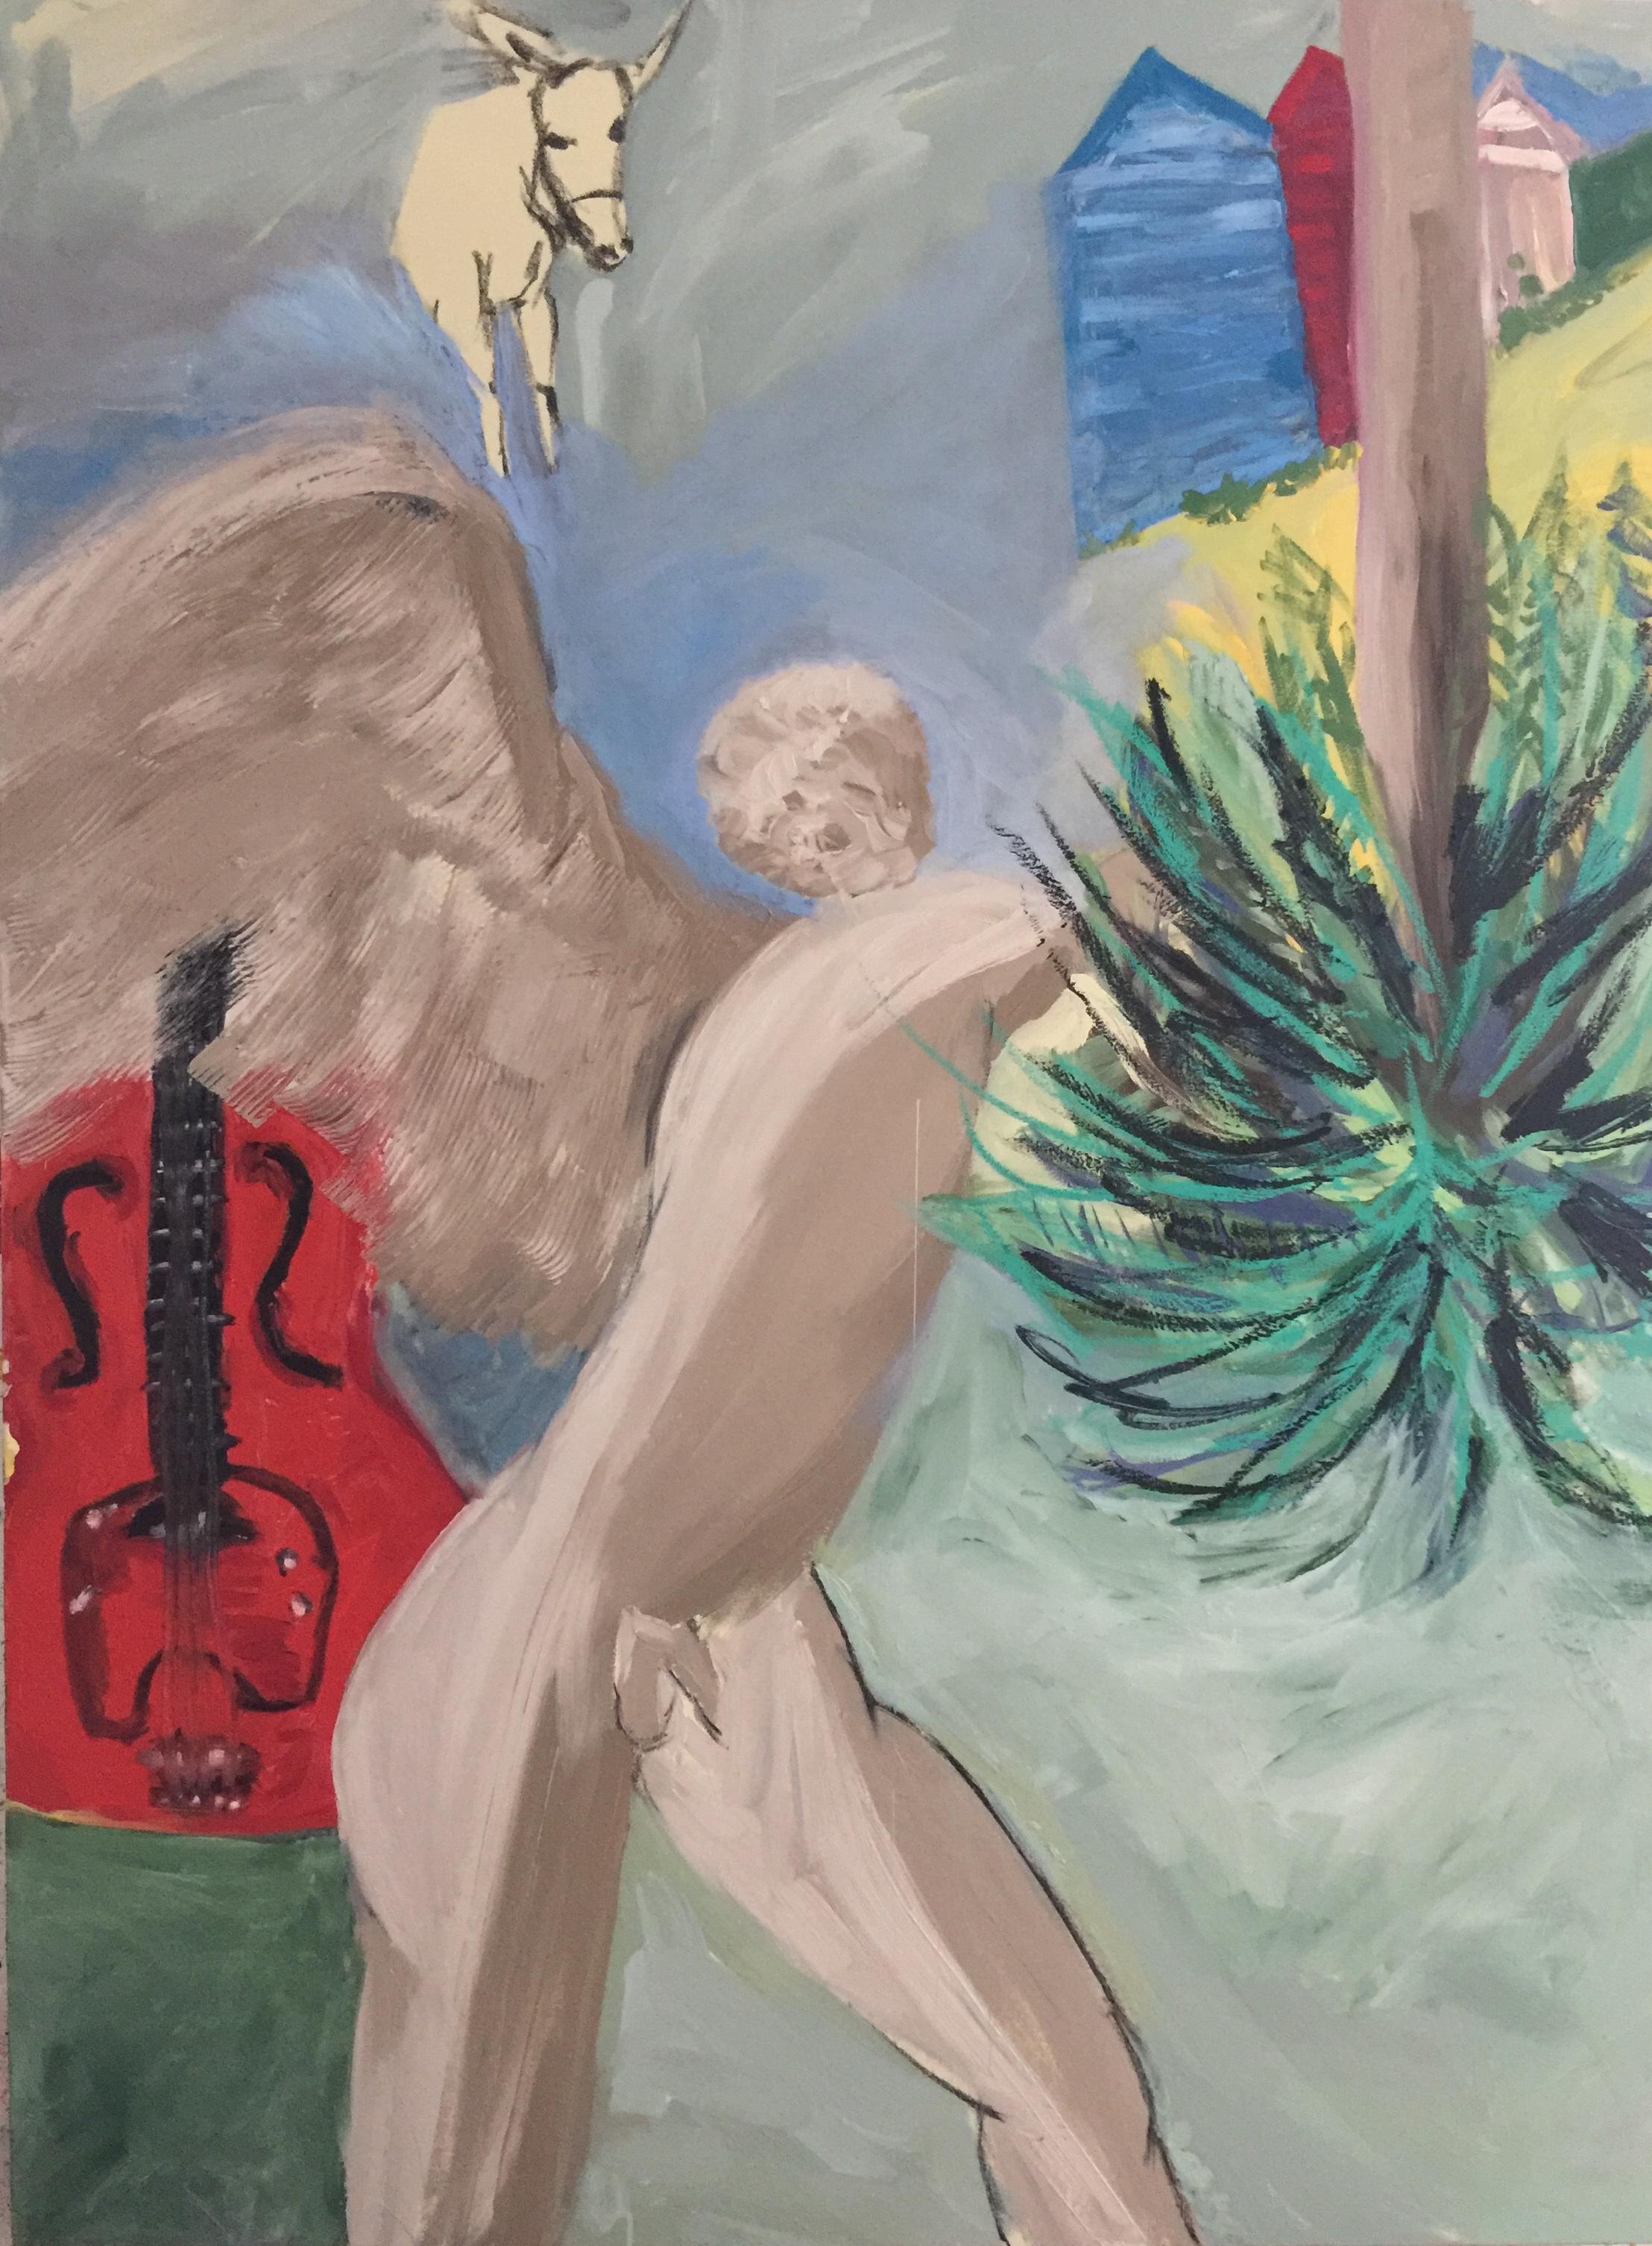 Patti Smith Land 250: Cupidon, L'Hermitage St. Petersburg; Steel Guitar d'Oliver Ray; Palmier, Nuit, Florida; Cabanes de Plage, Southwold; Ane, Namibie.